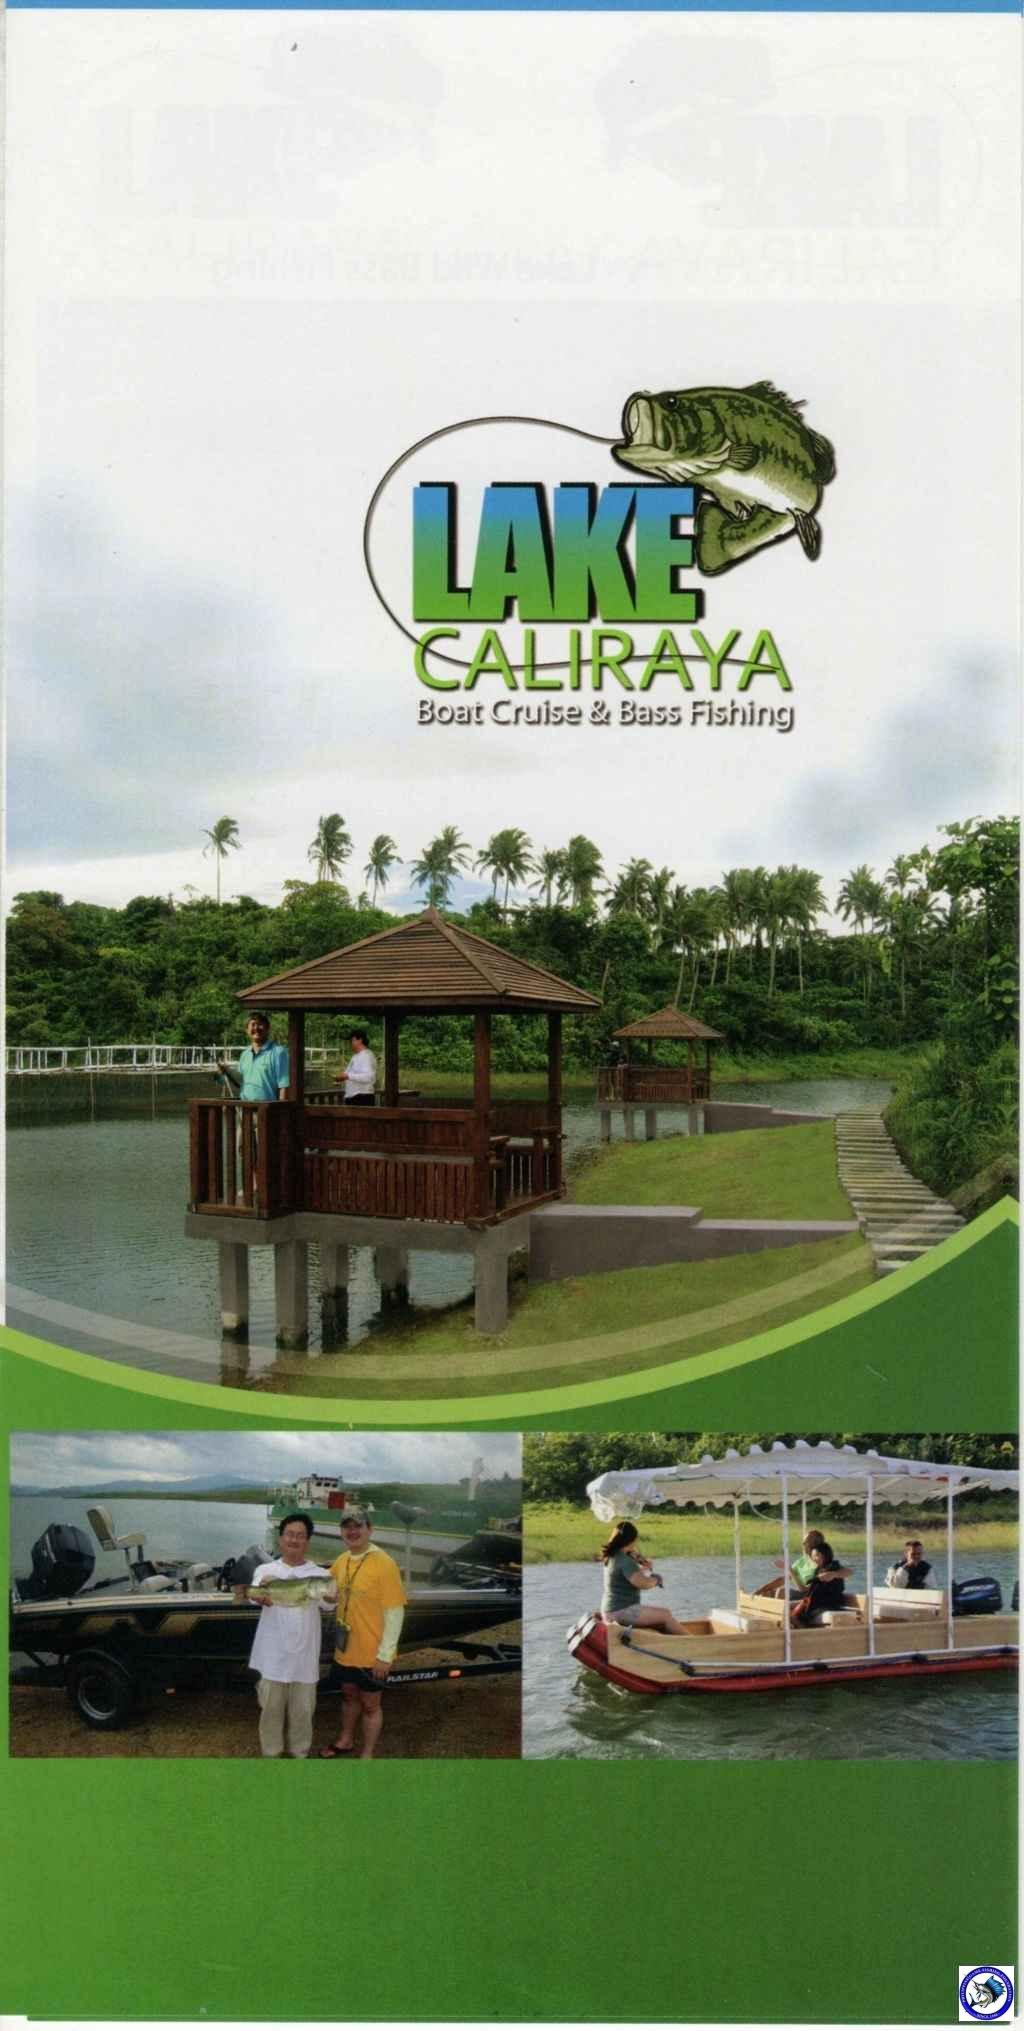 Lake Caleraya1.jpg